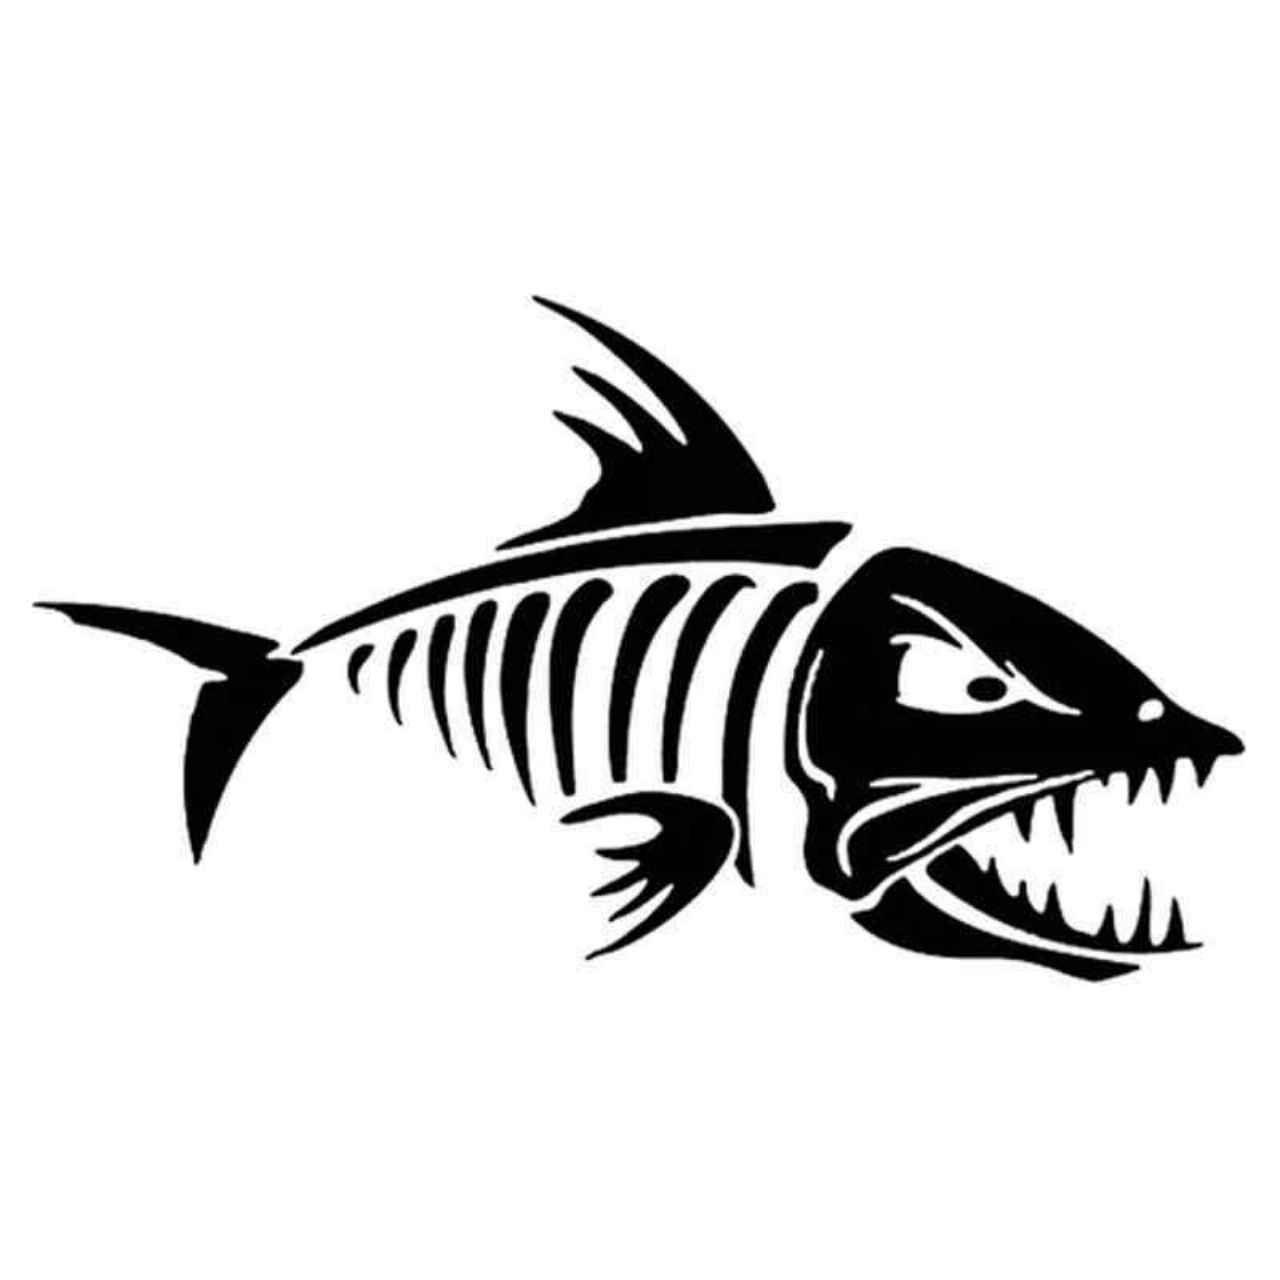 Catfish clipart skeleton. Fish decal sticker skeletons